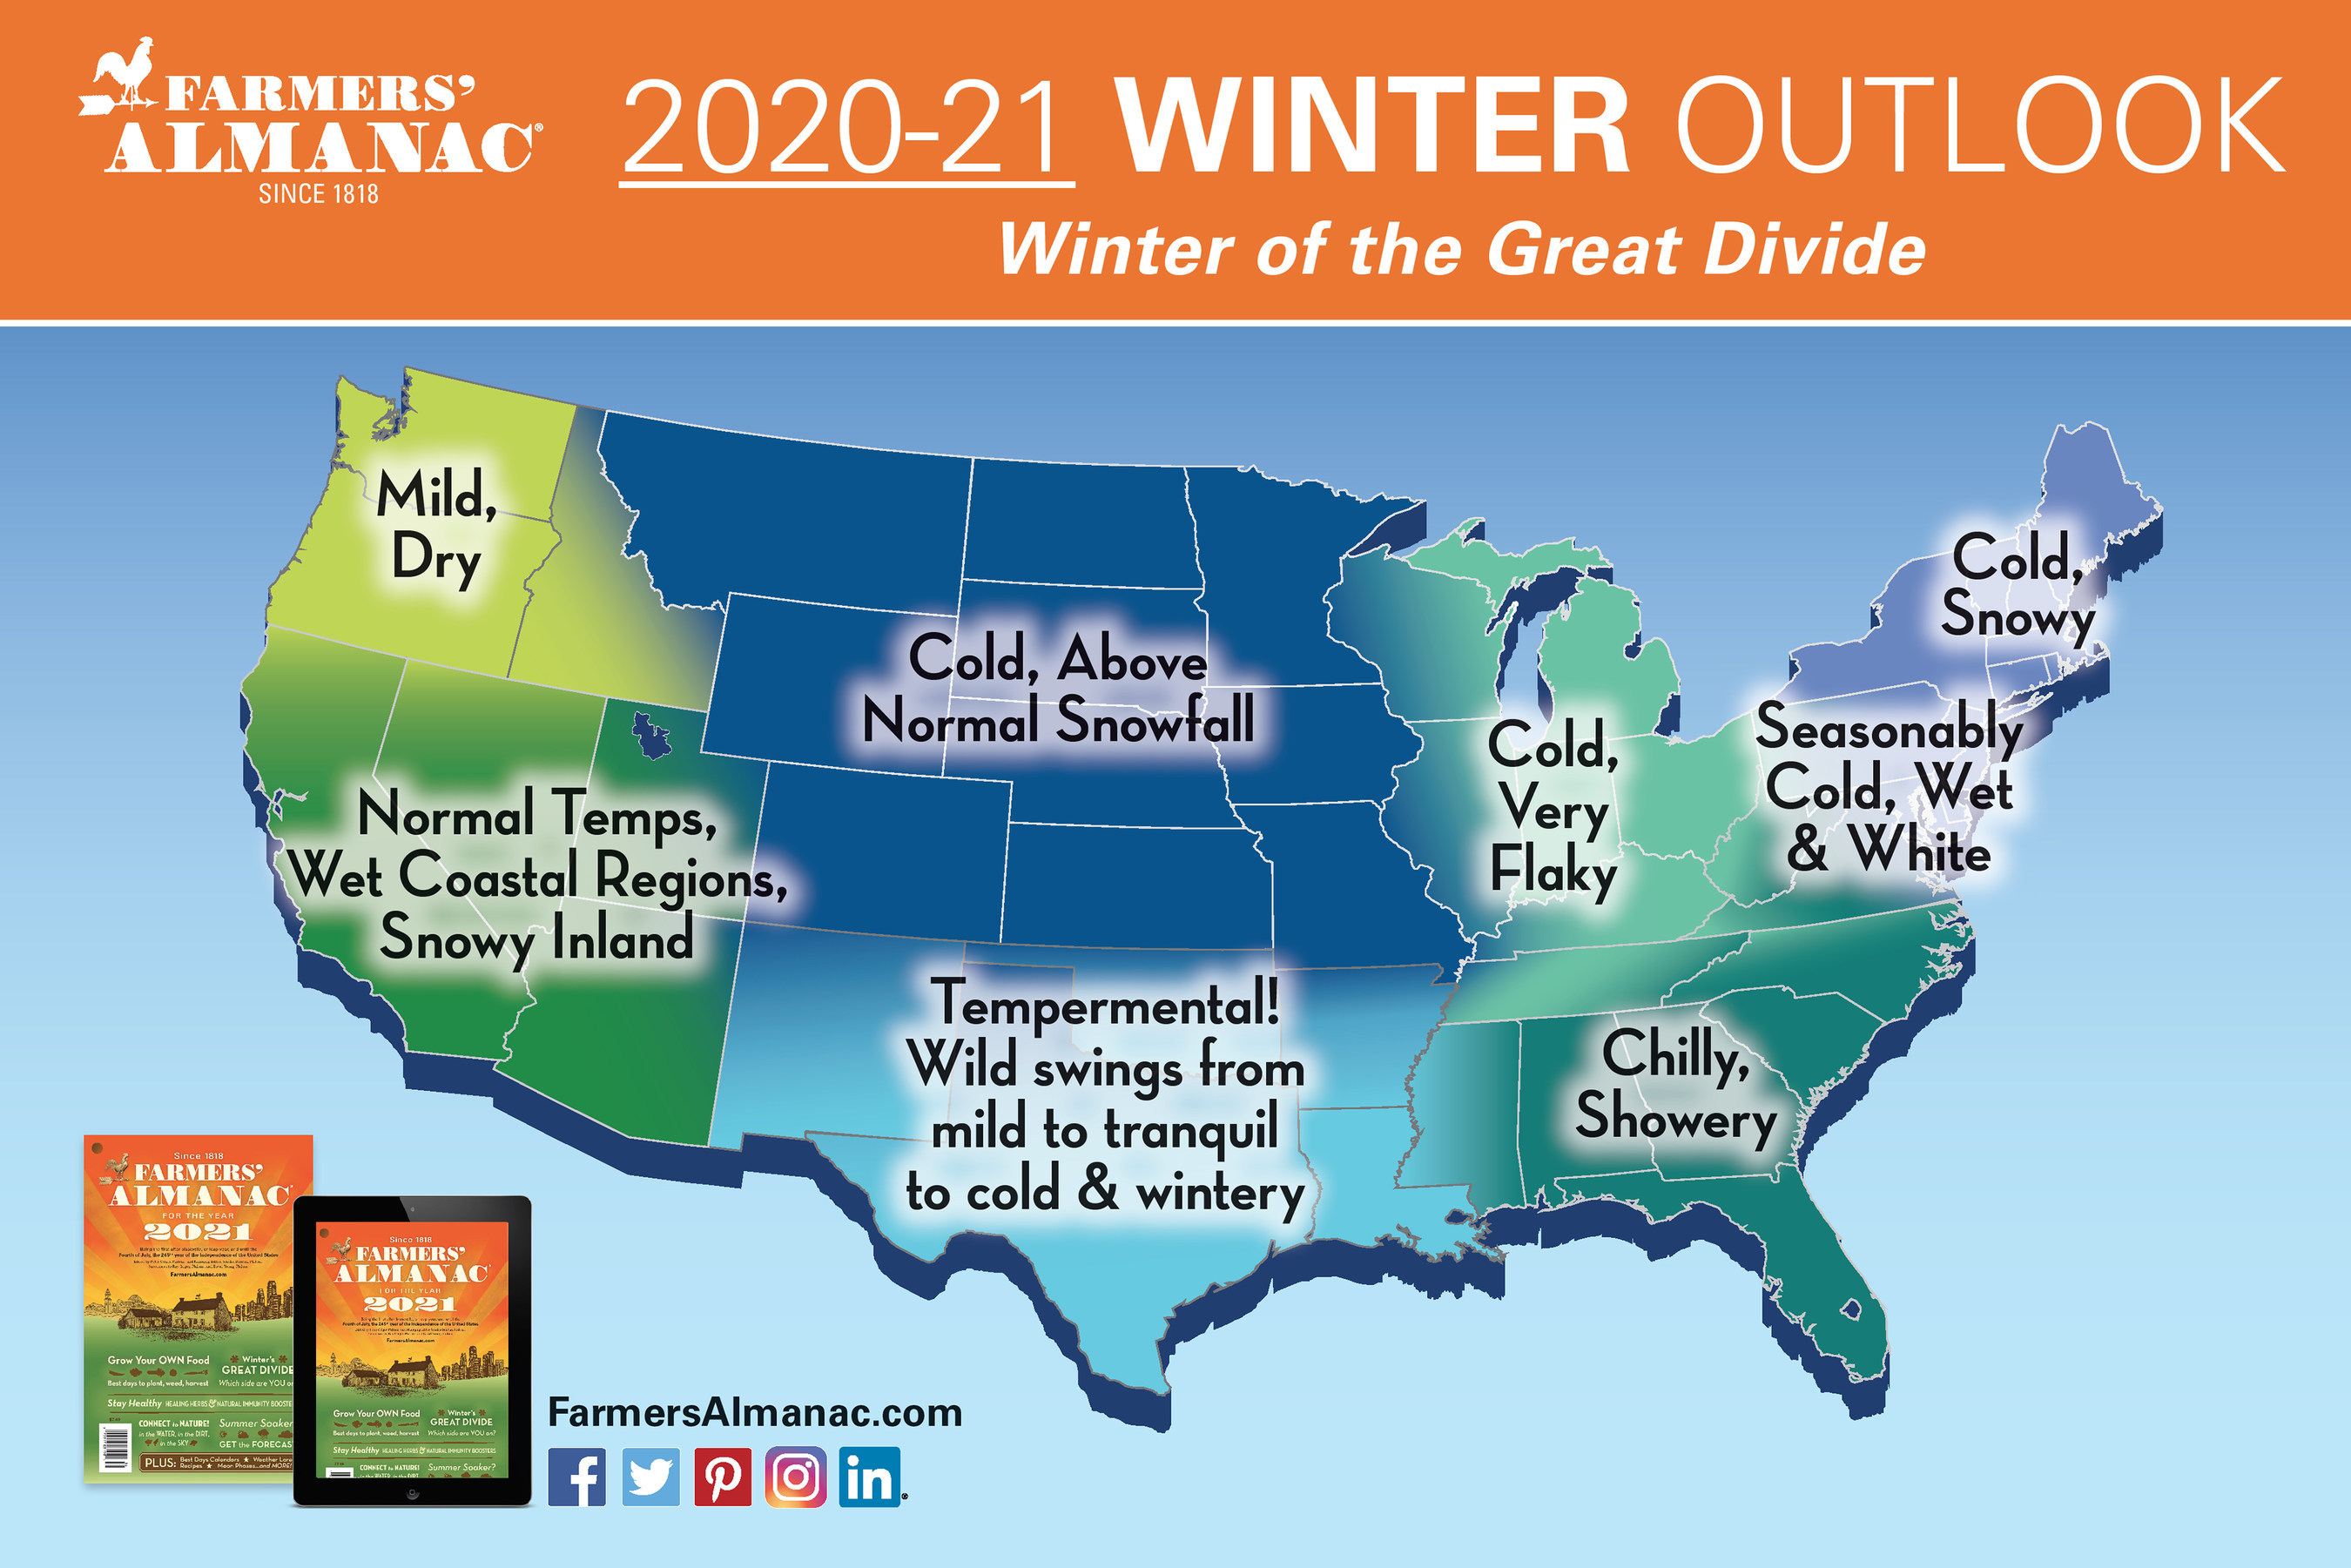 Farmers' Almanac 2020-21 Winter Outlook infographic